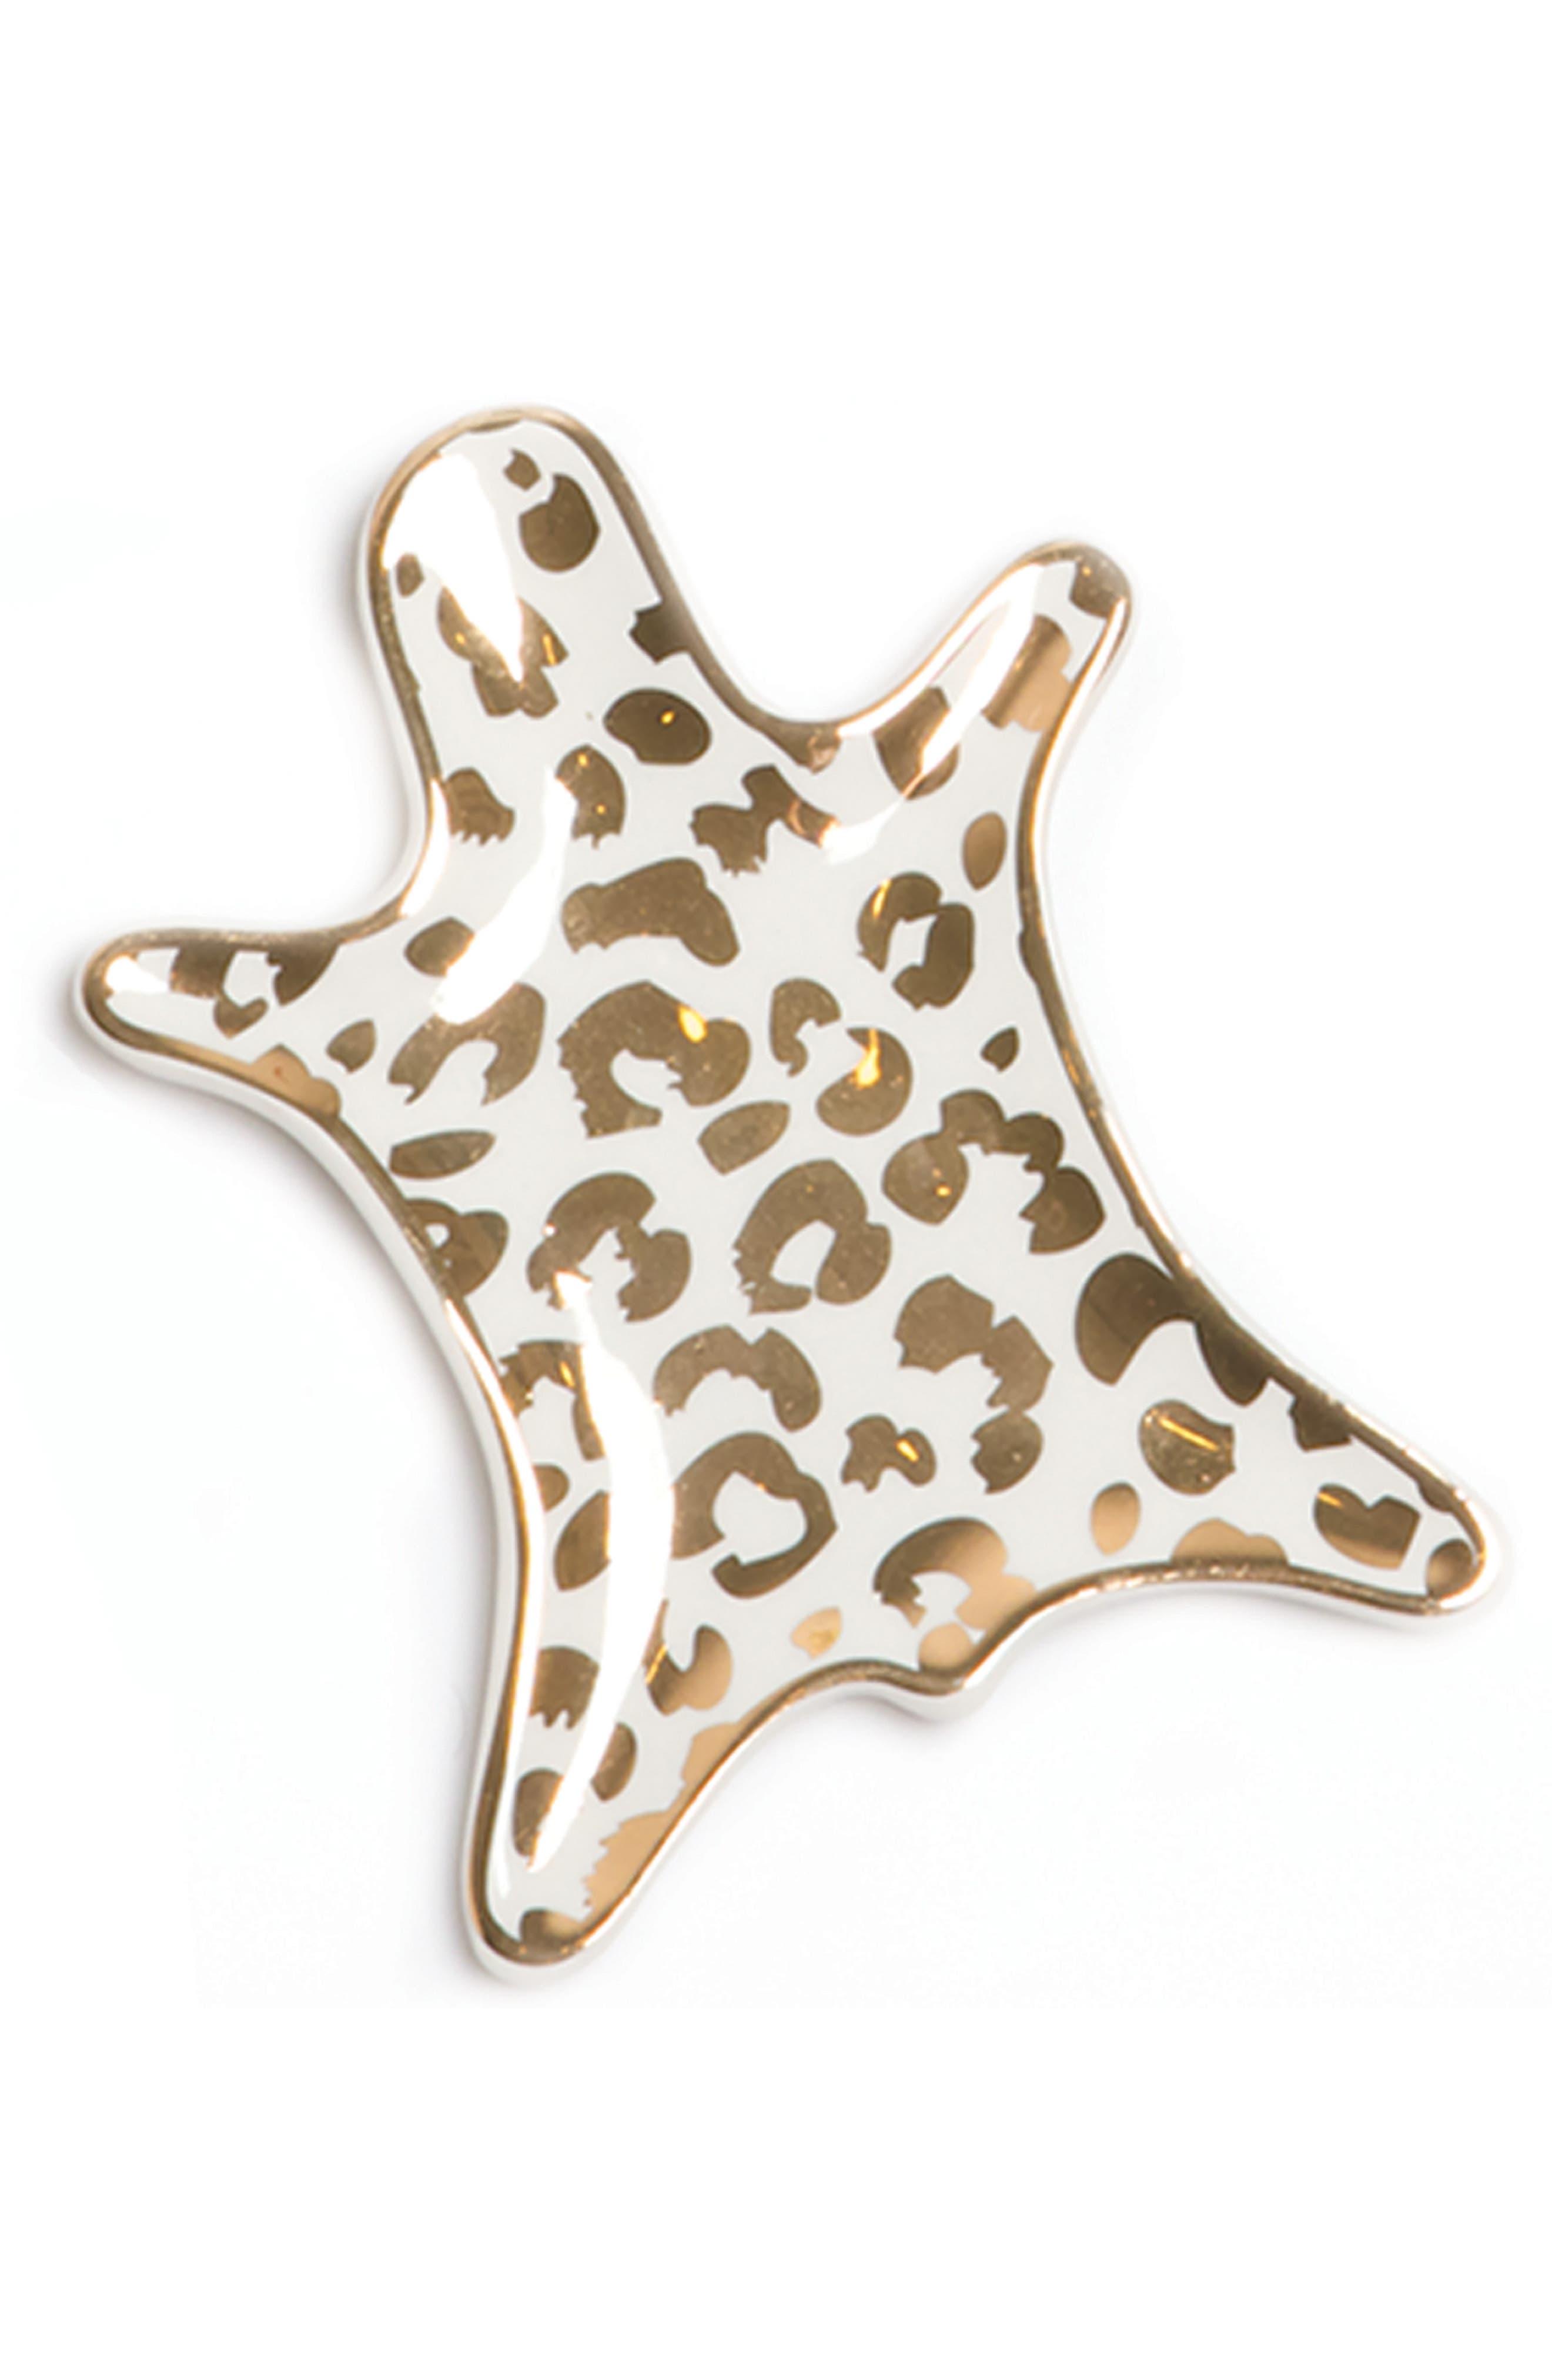 Leopard Ceramic Dish,                             Main thumbnail 1, color,                             Gold